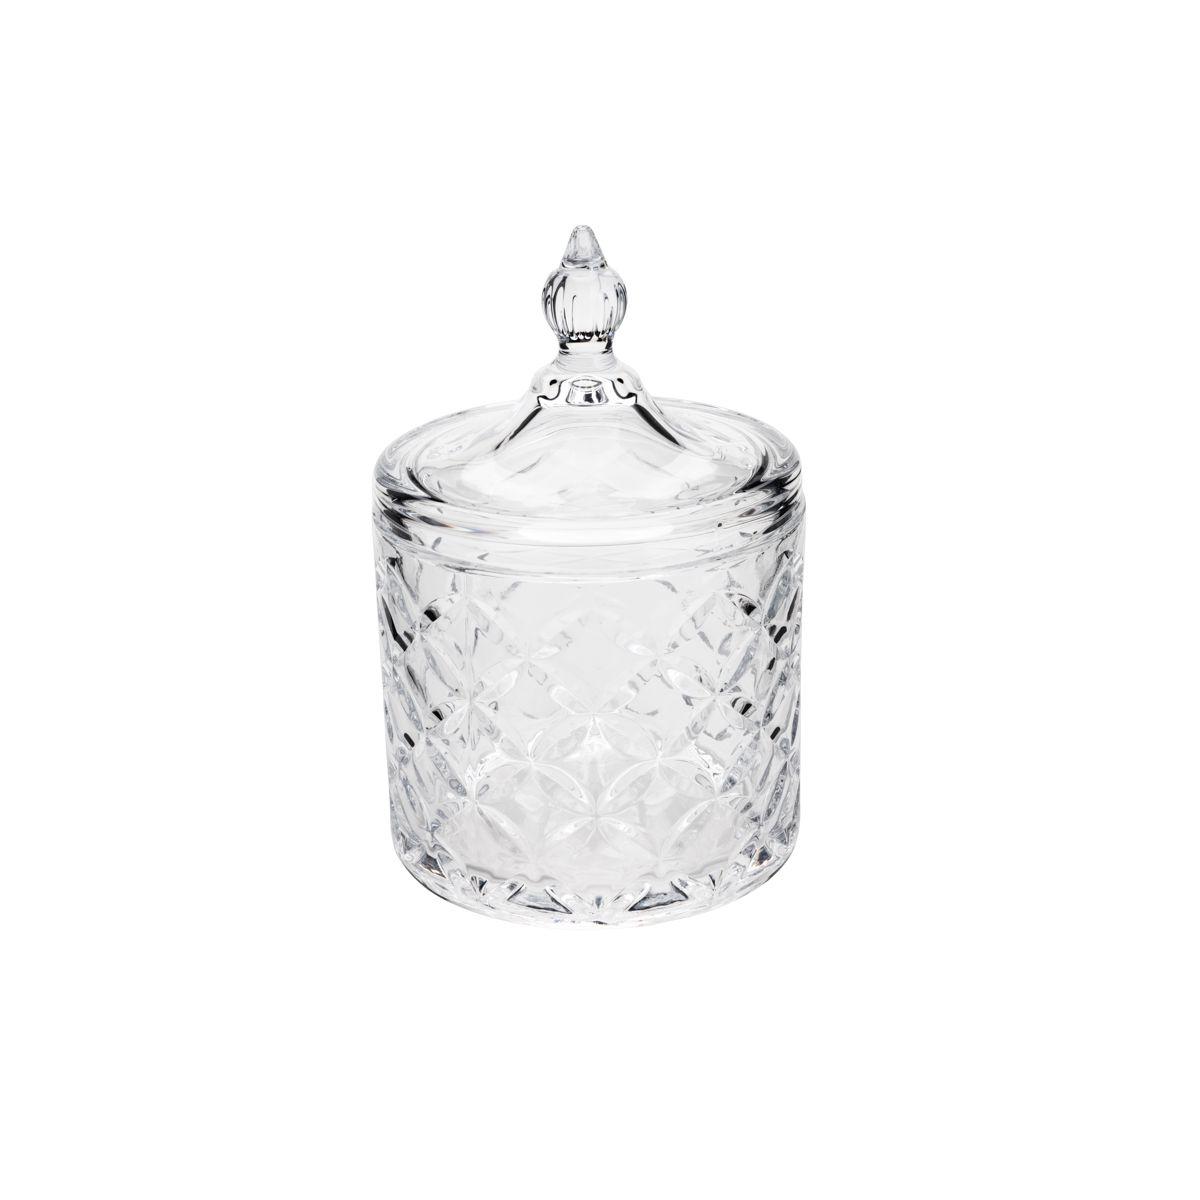 Bomboniere de Cristal De Chumbo Stella   10x15,5cm